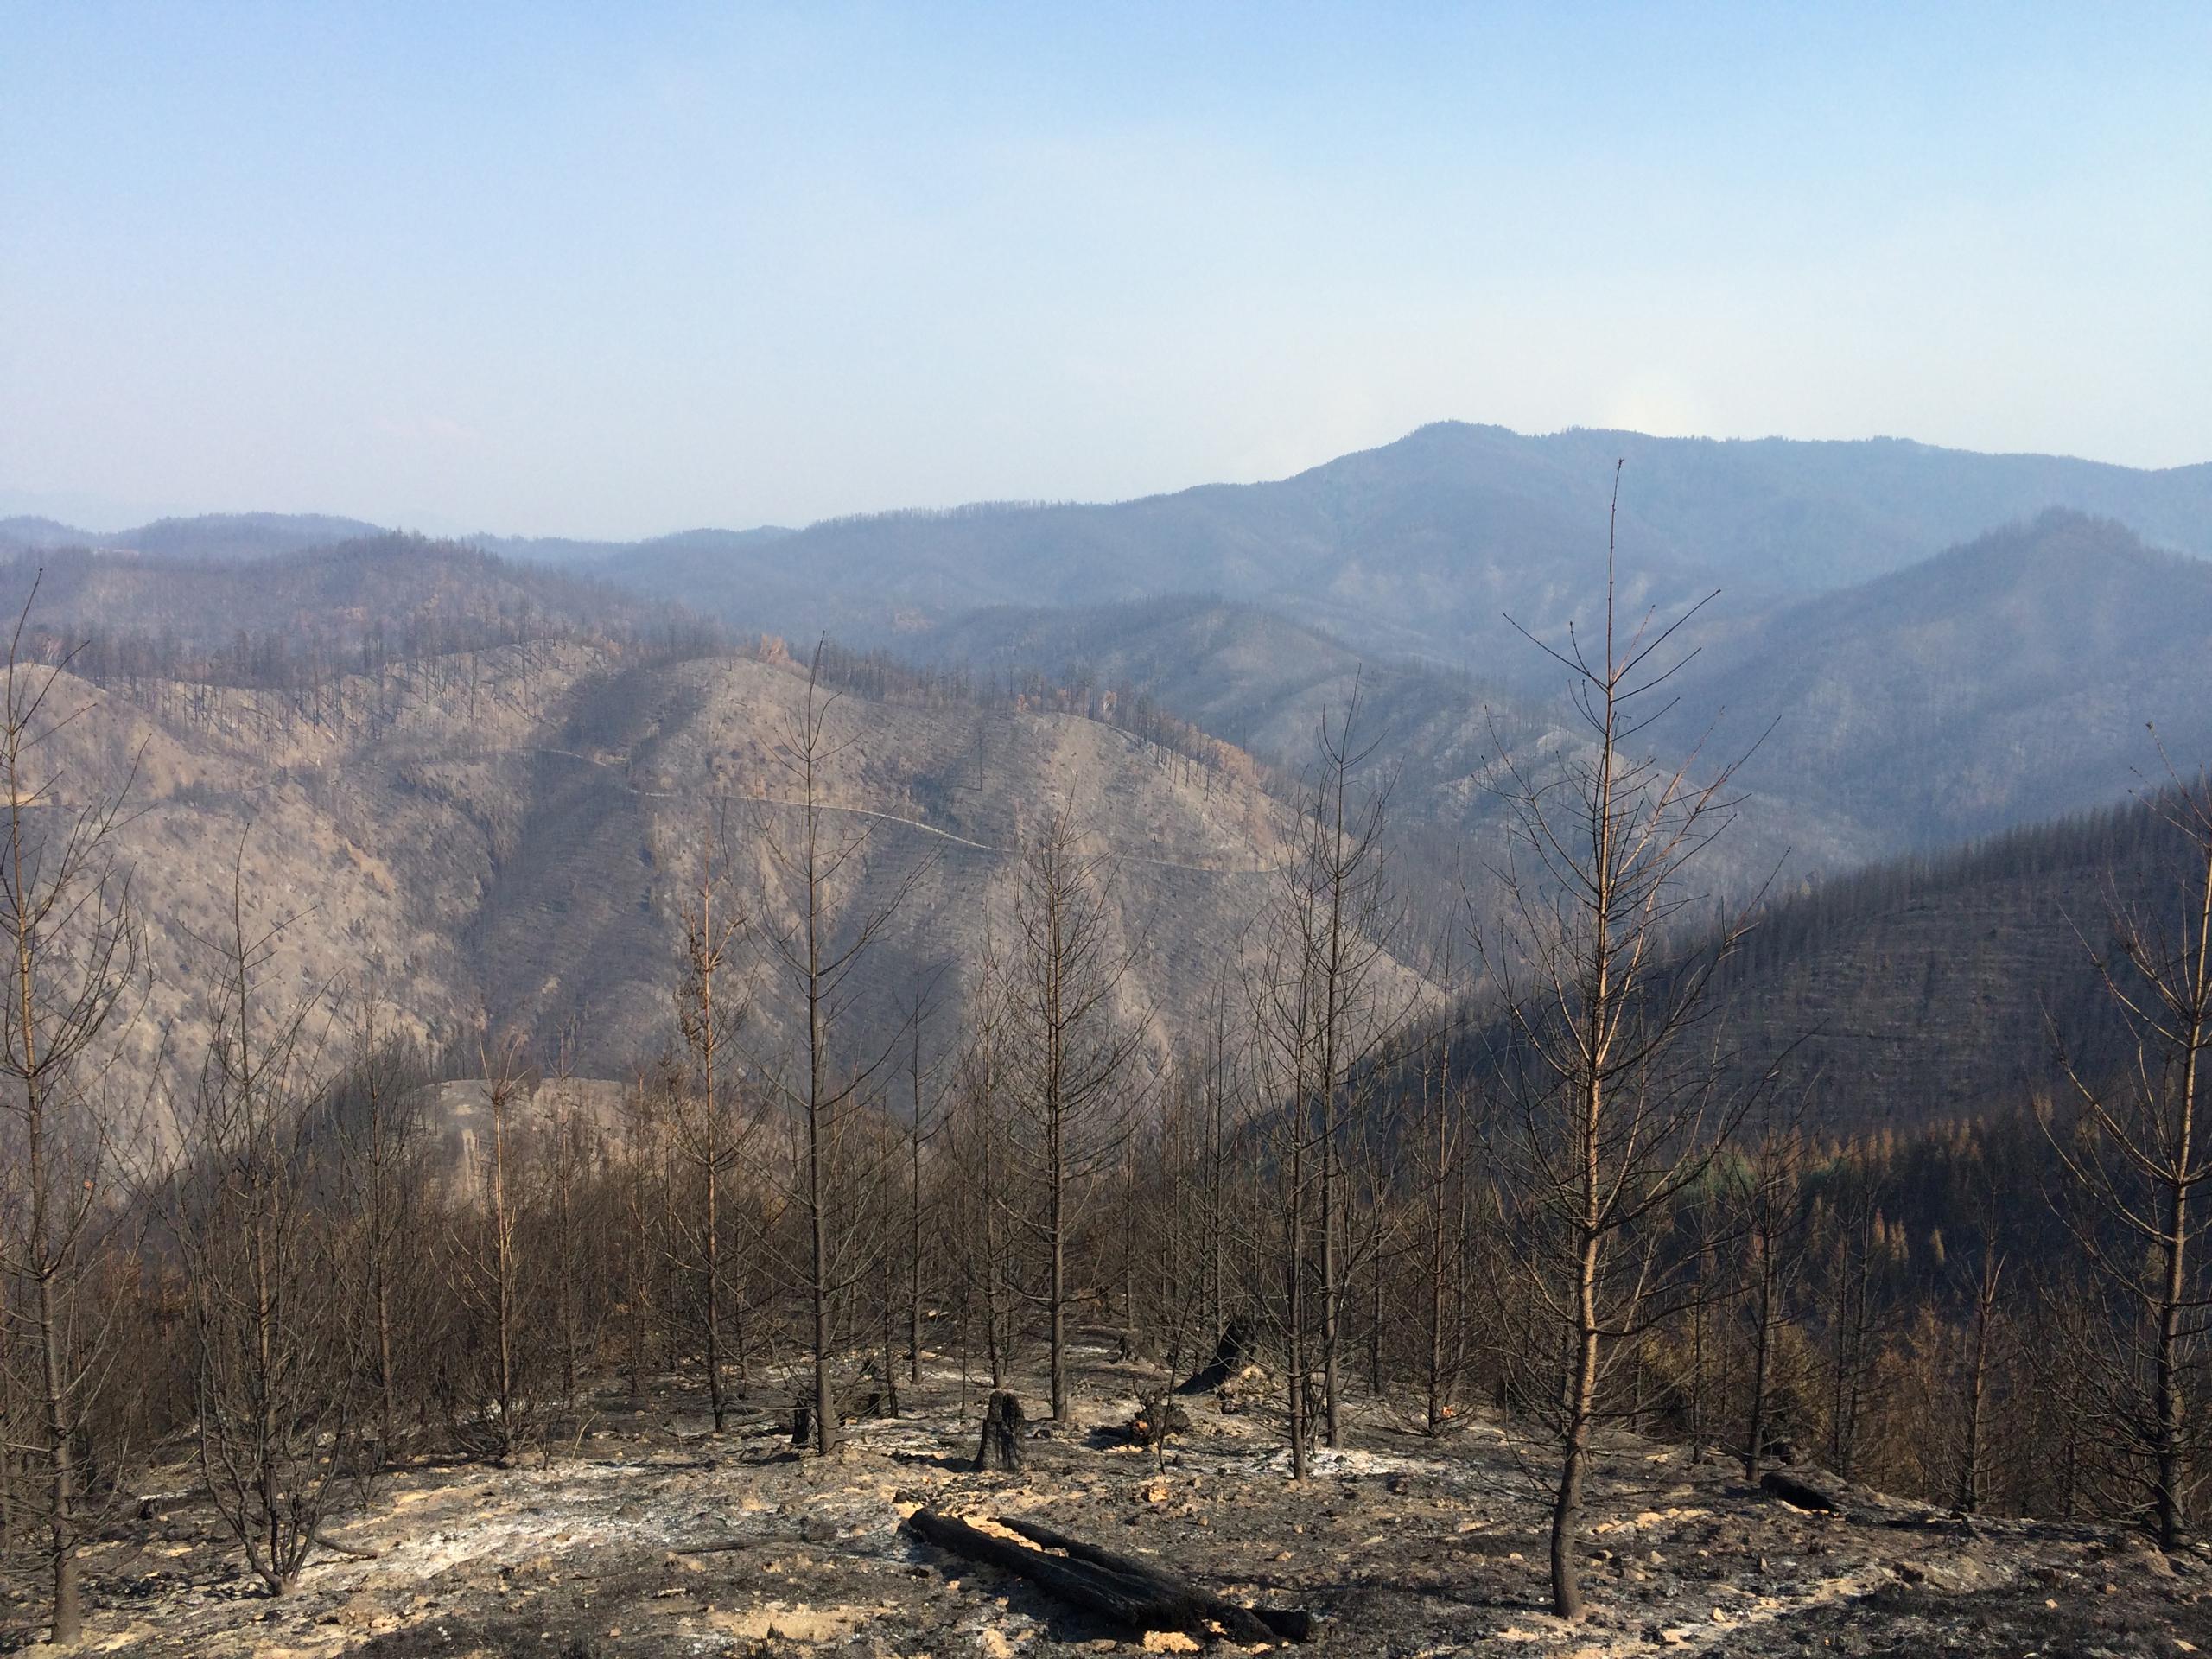 The Stouts Creek Fire